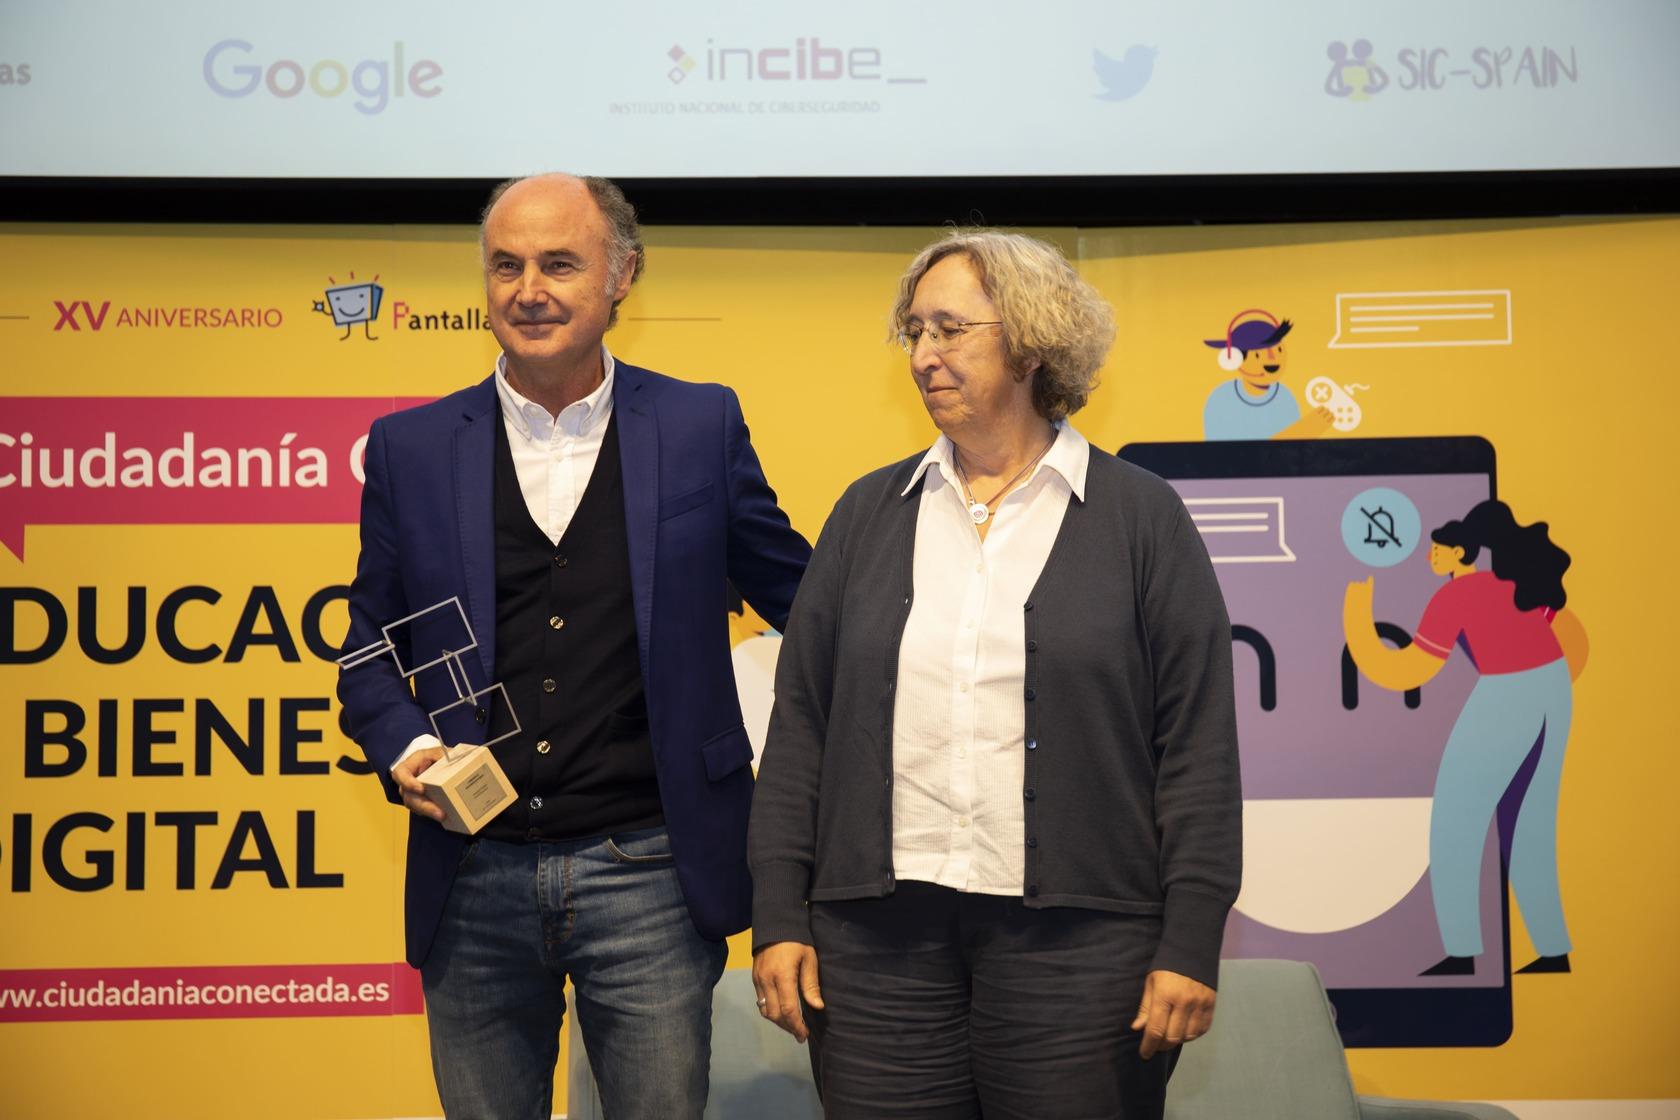 /Premio-PantallasAmigas-Trayectoria-profesional-Jose-Antonio-Luengo-Latorre